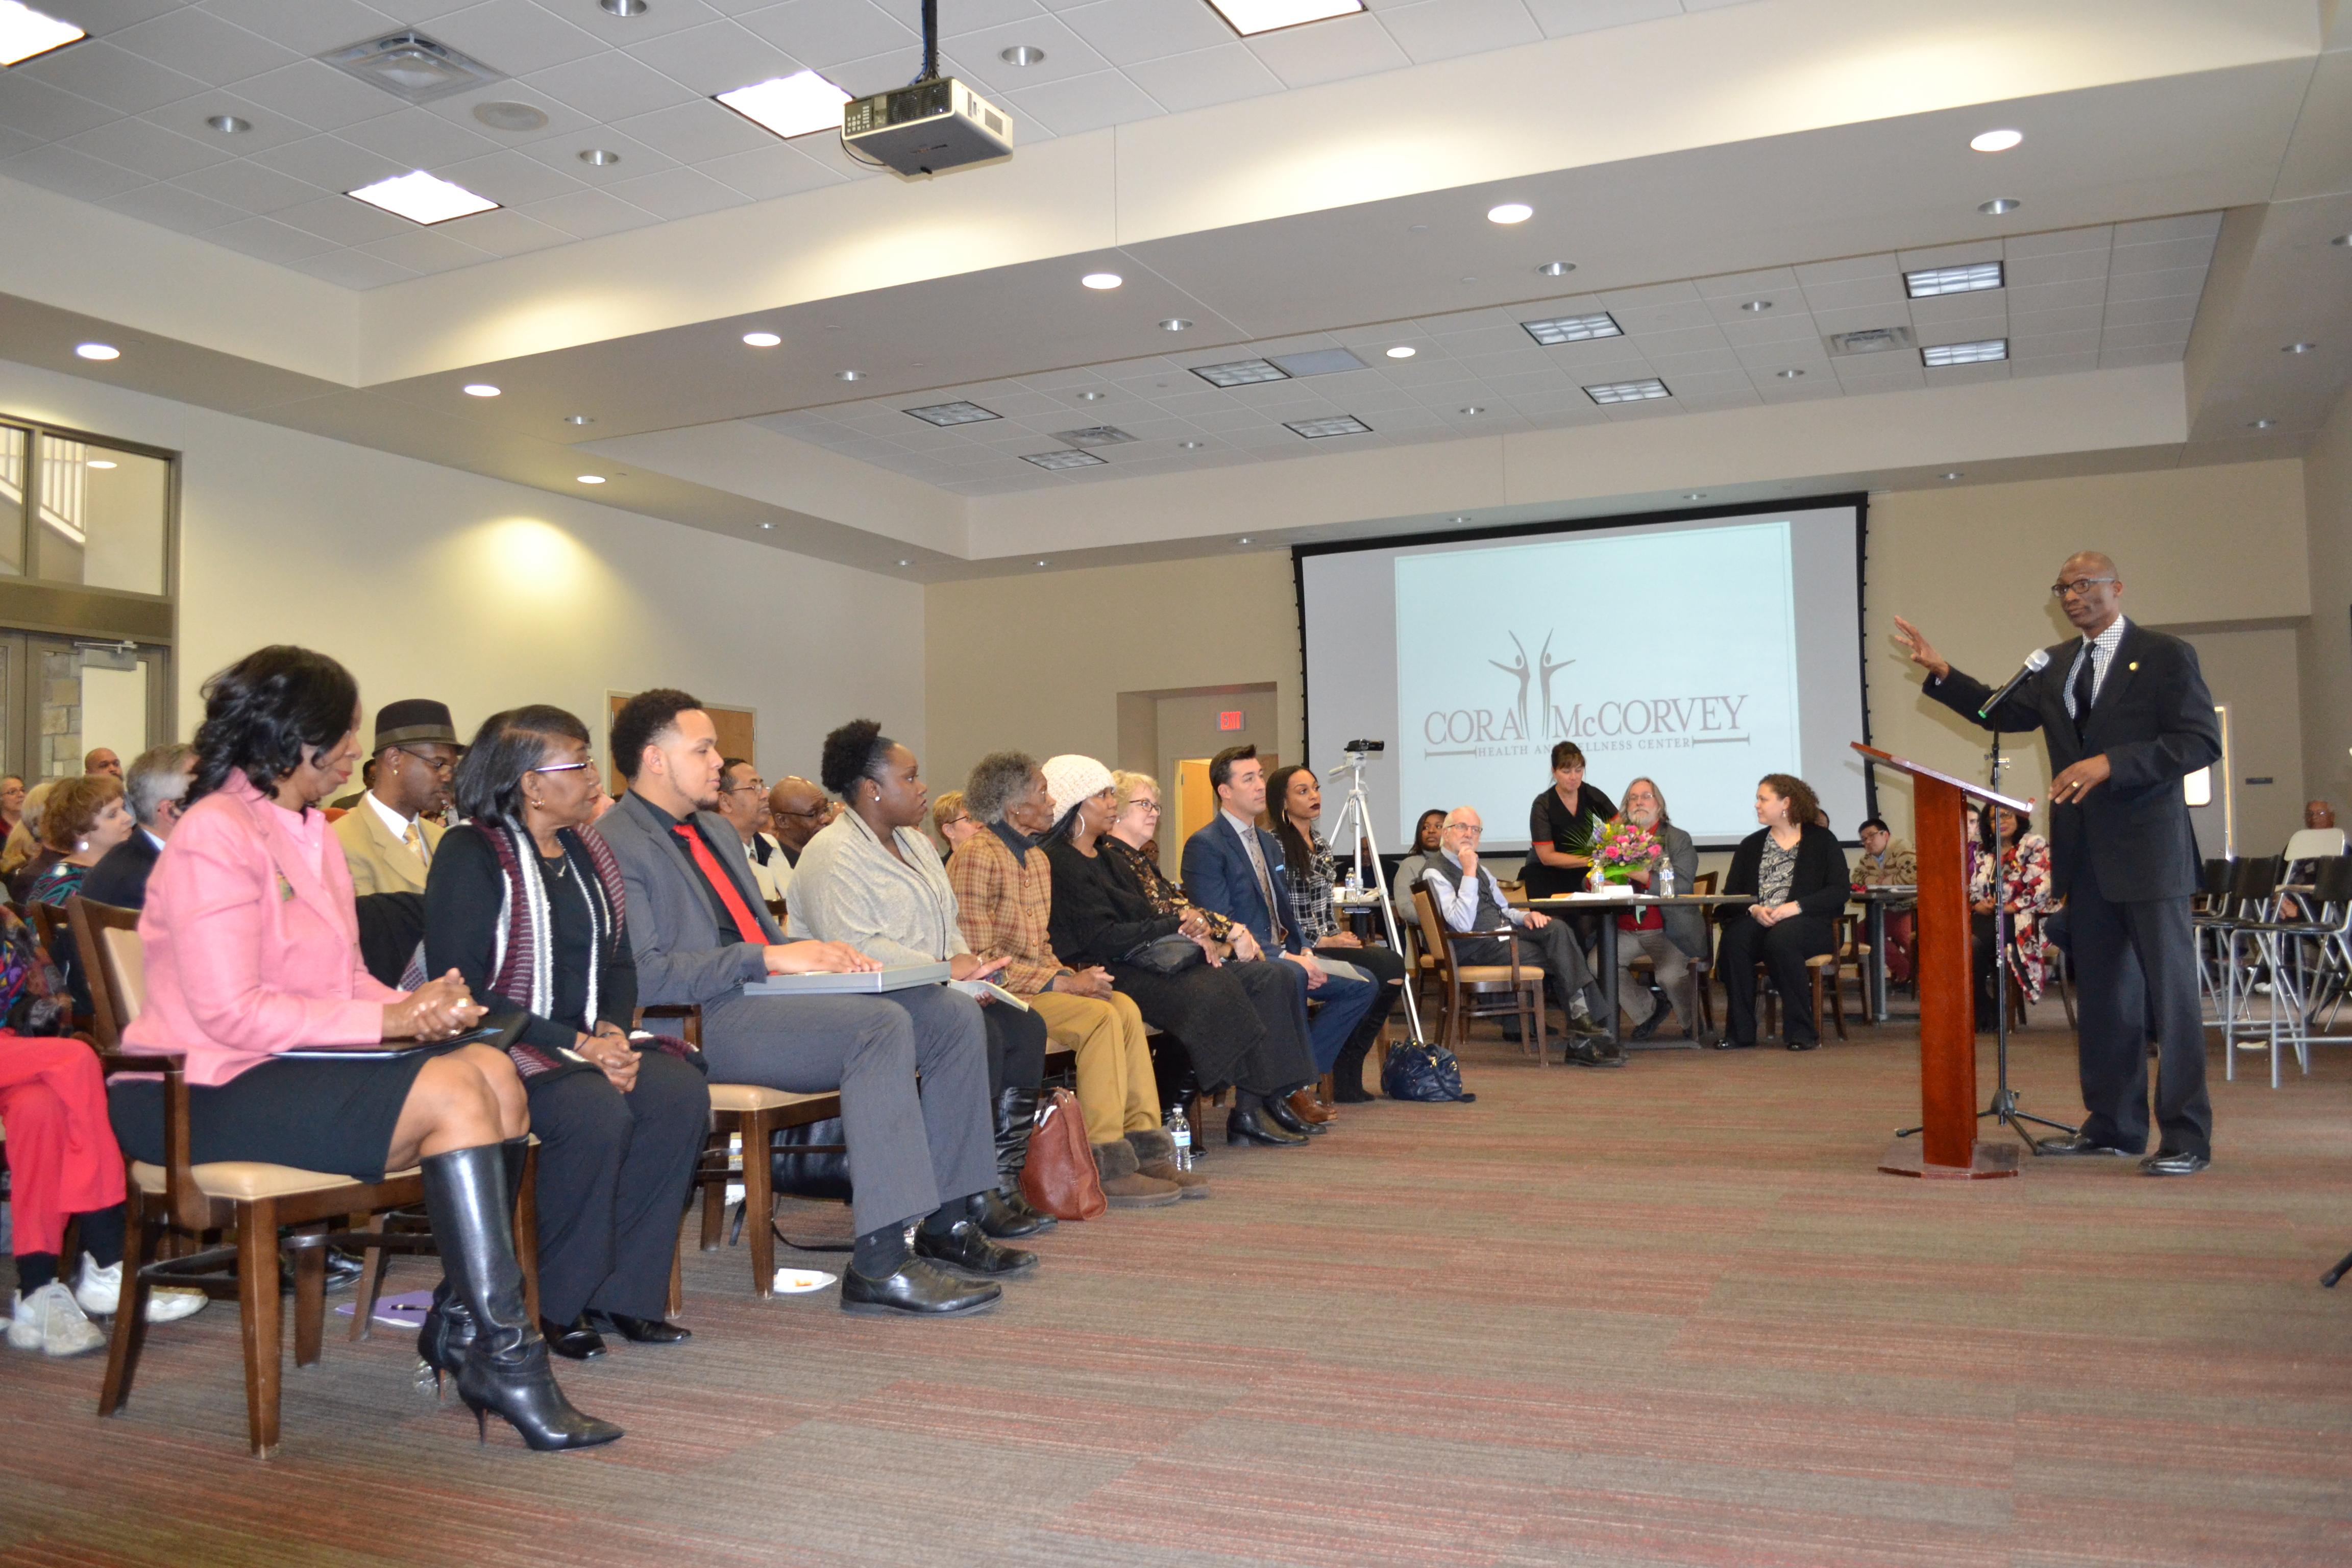 State Sen. Bobby Joe Champion speaks at Cora McCorvey Center Dedication